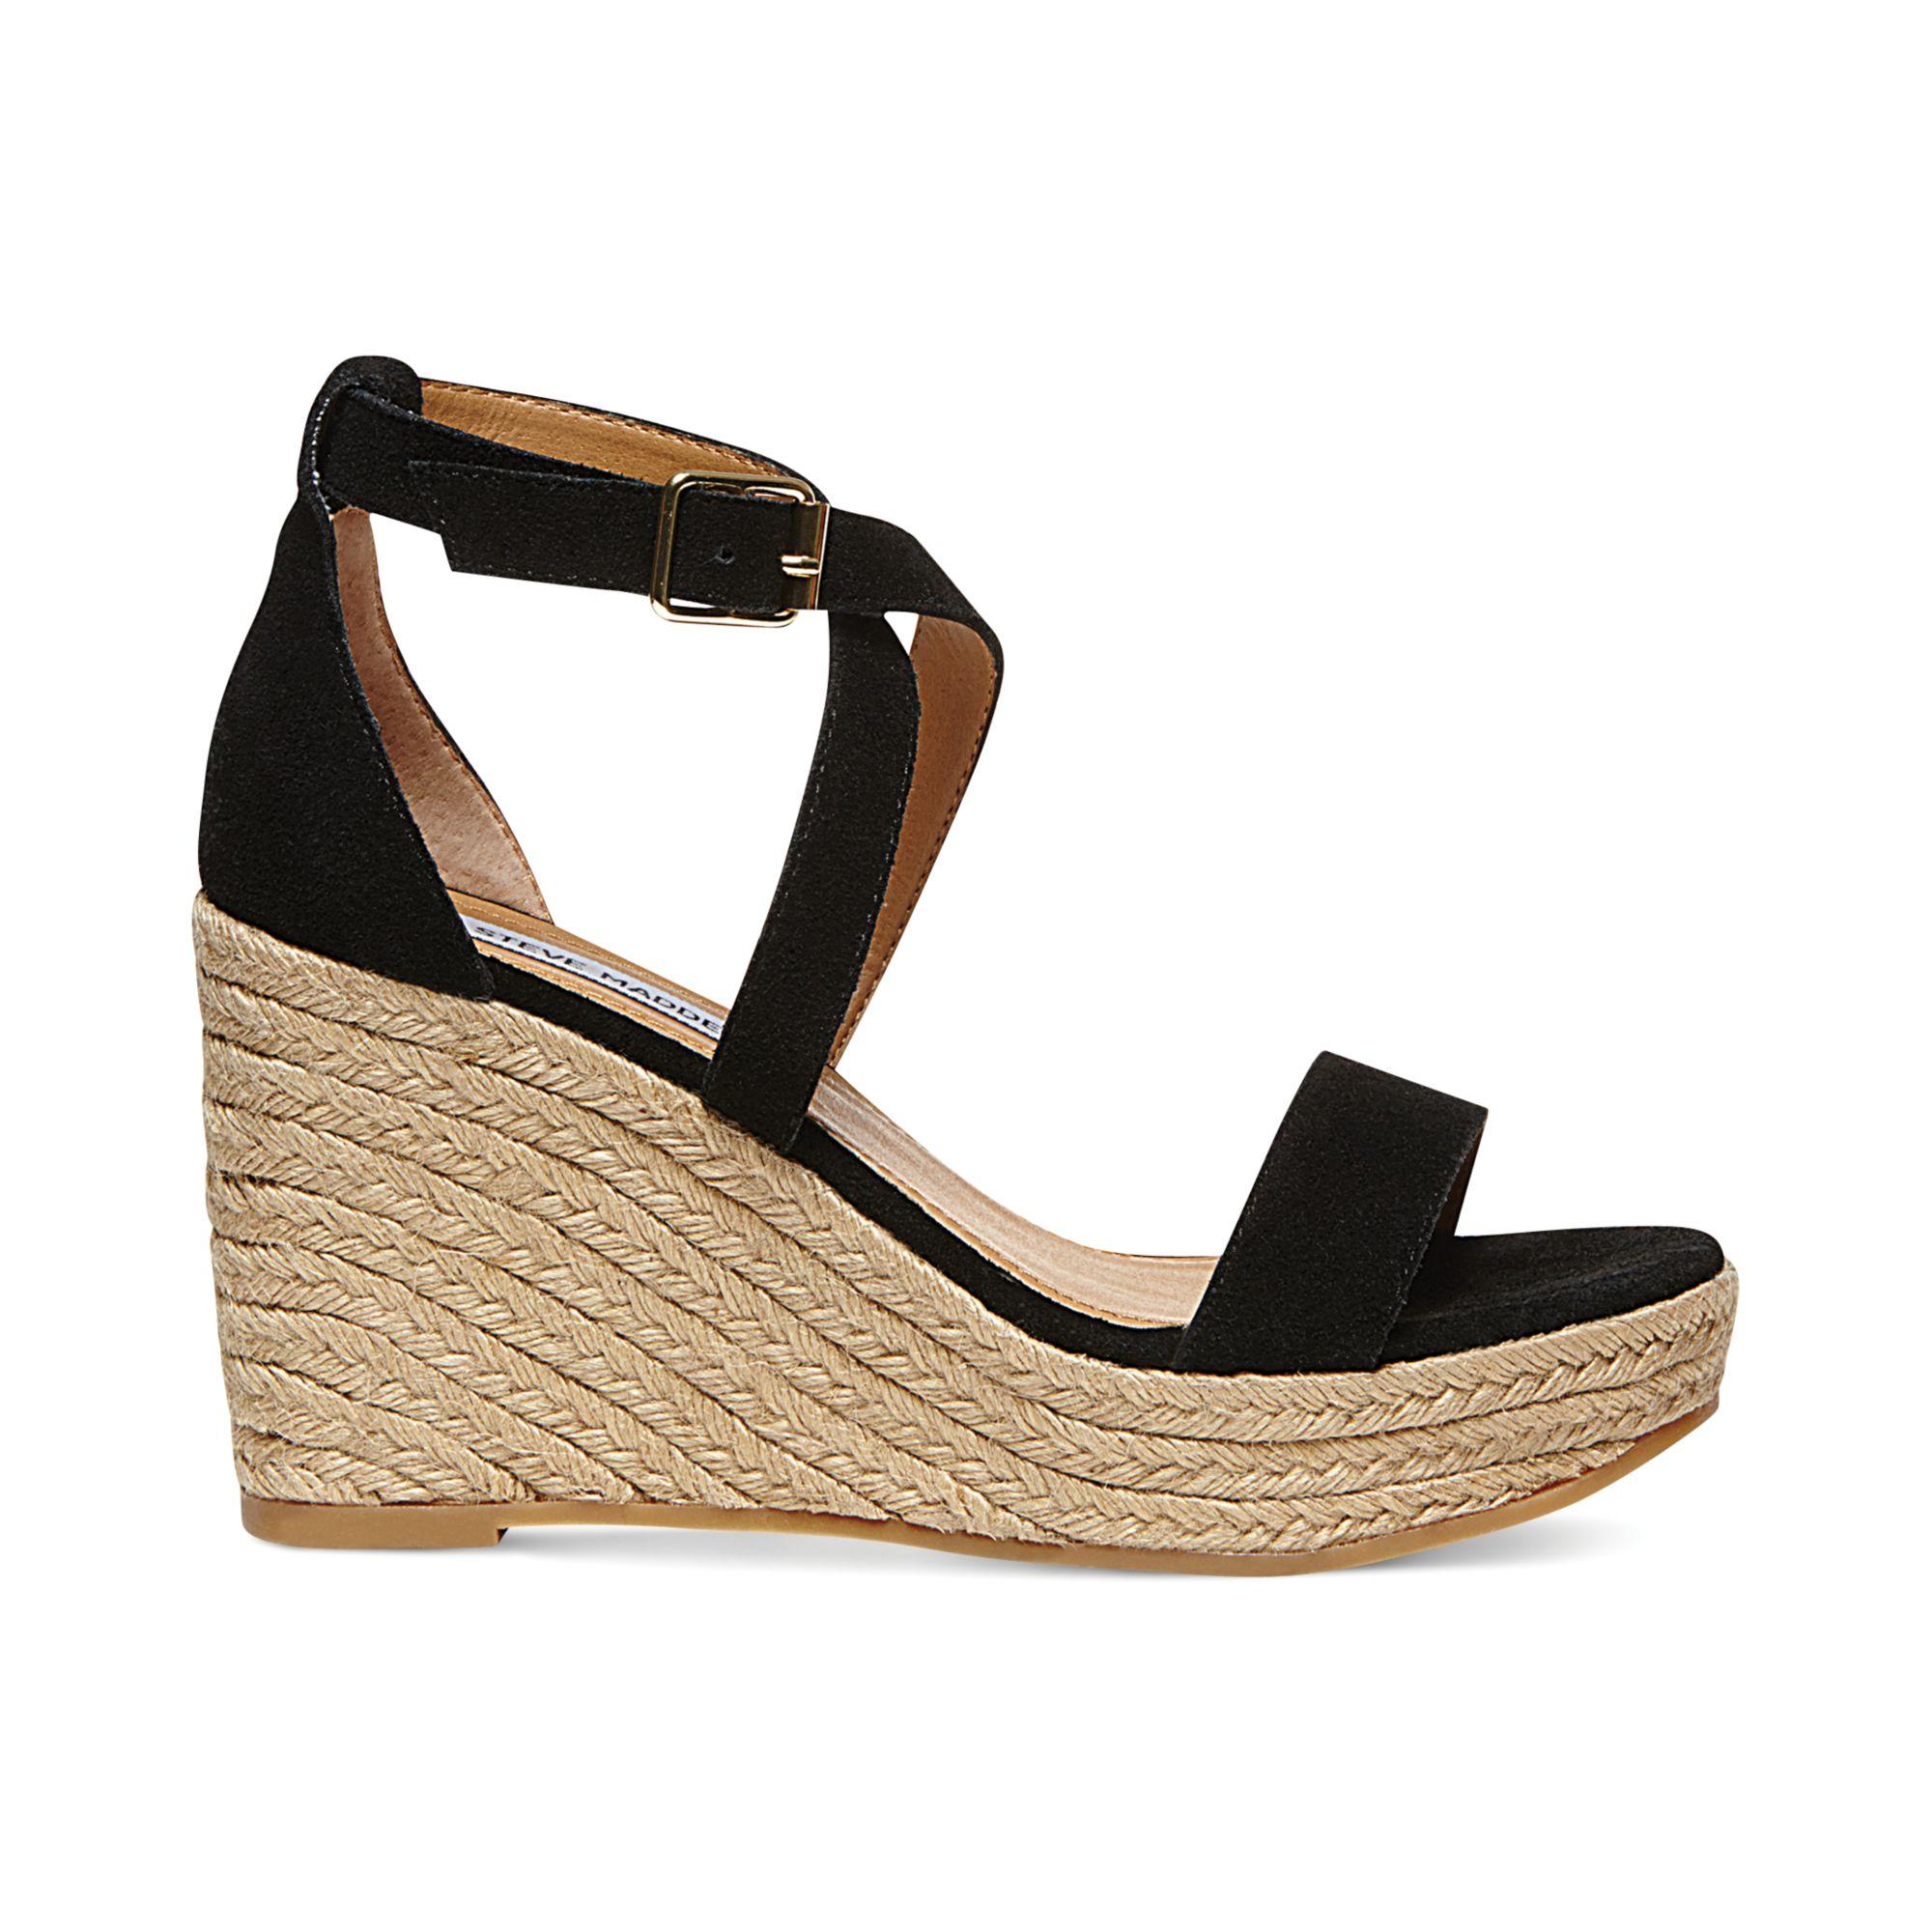 Lyst - Steve Madden Womens Montaukk Platform Wedge Sandals ...